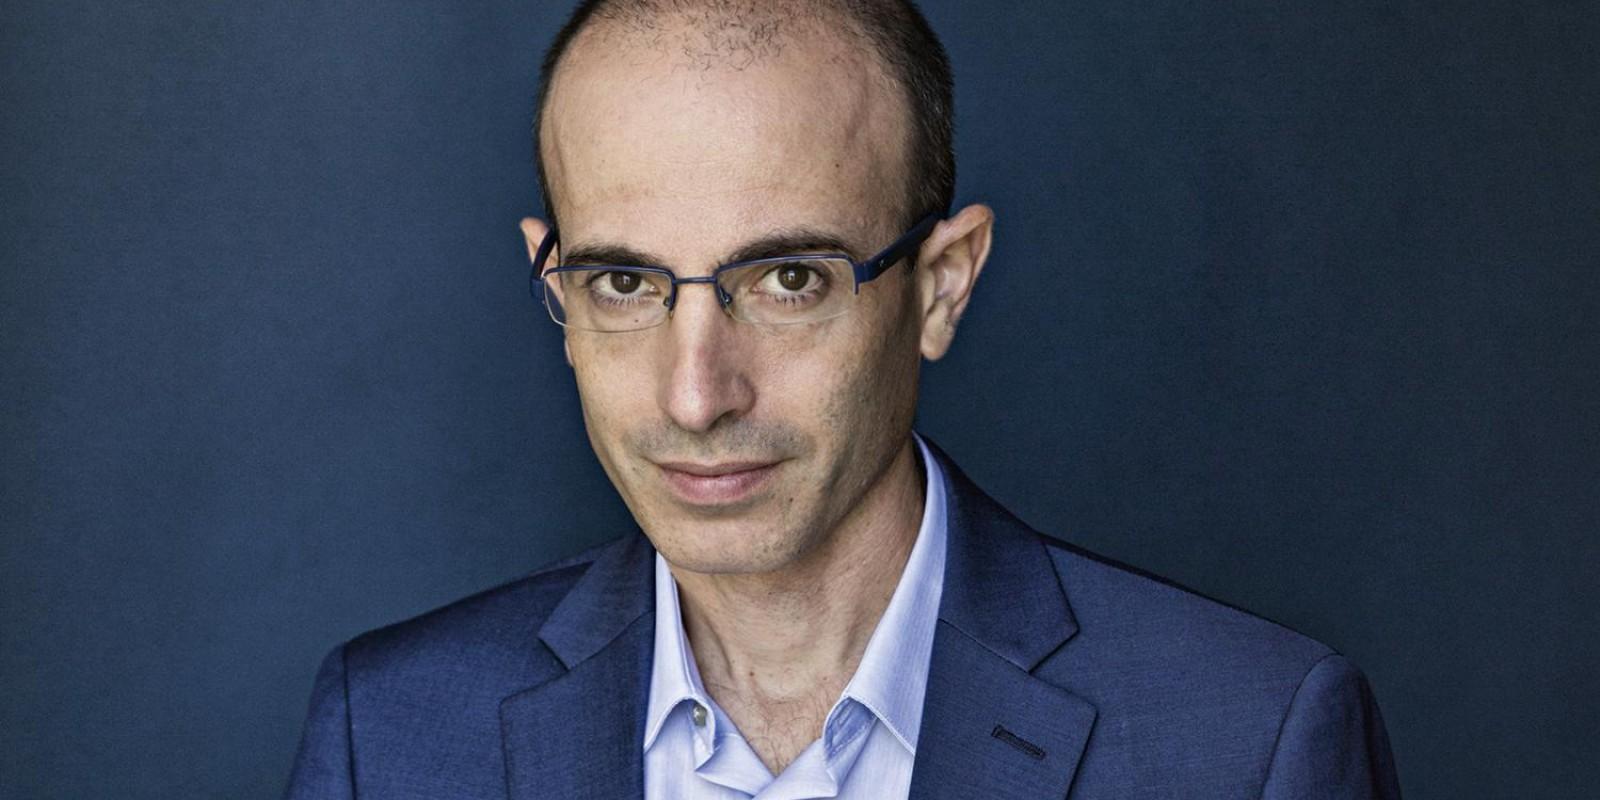 O Papel dos Cientistas no Debate sobre Bem-Estar Animal- Yuval Noah Harari